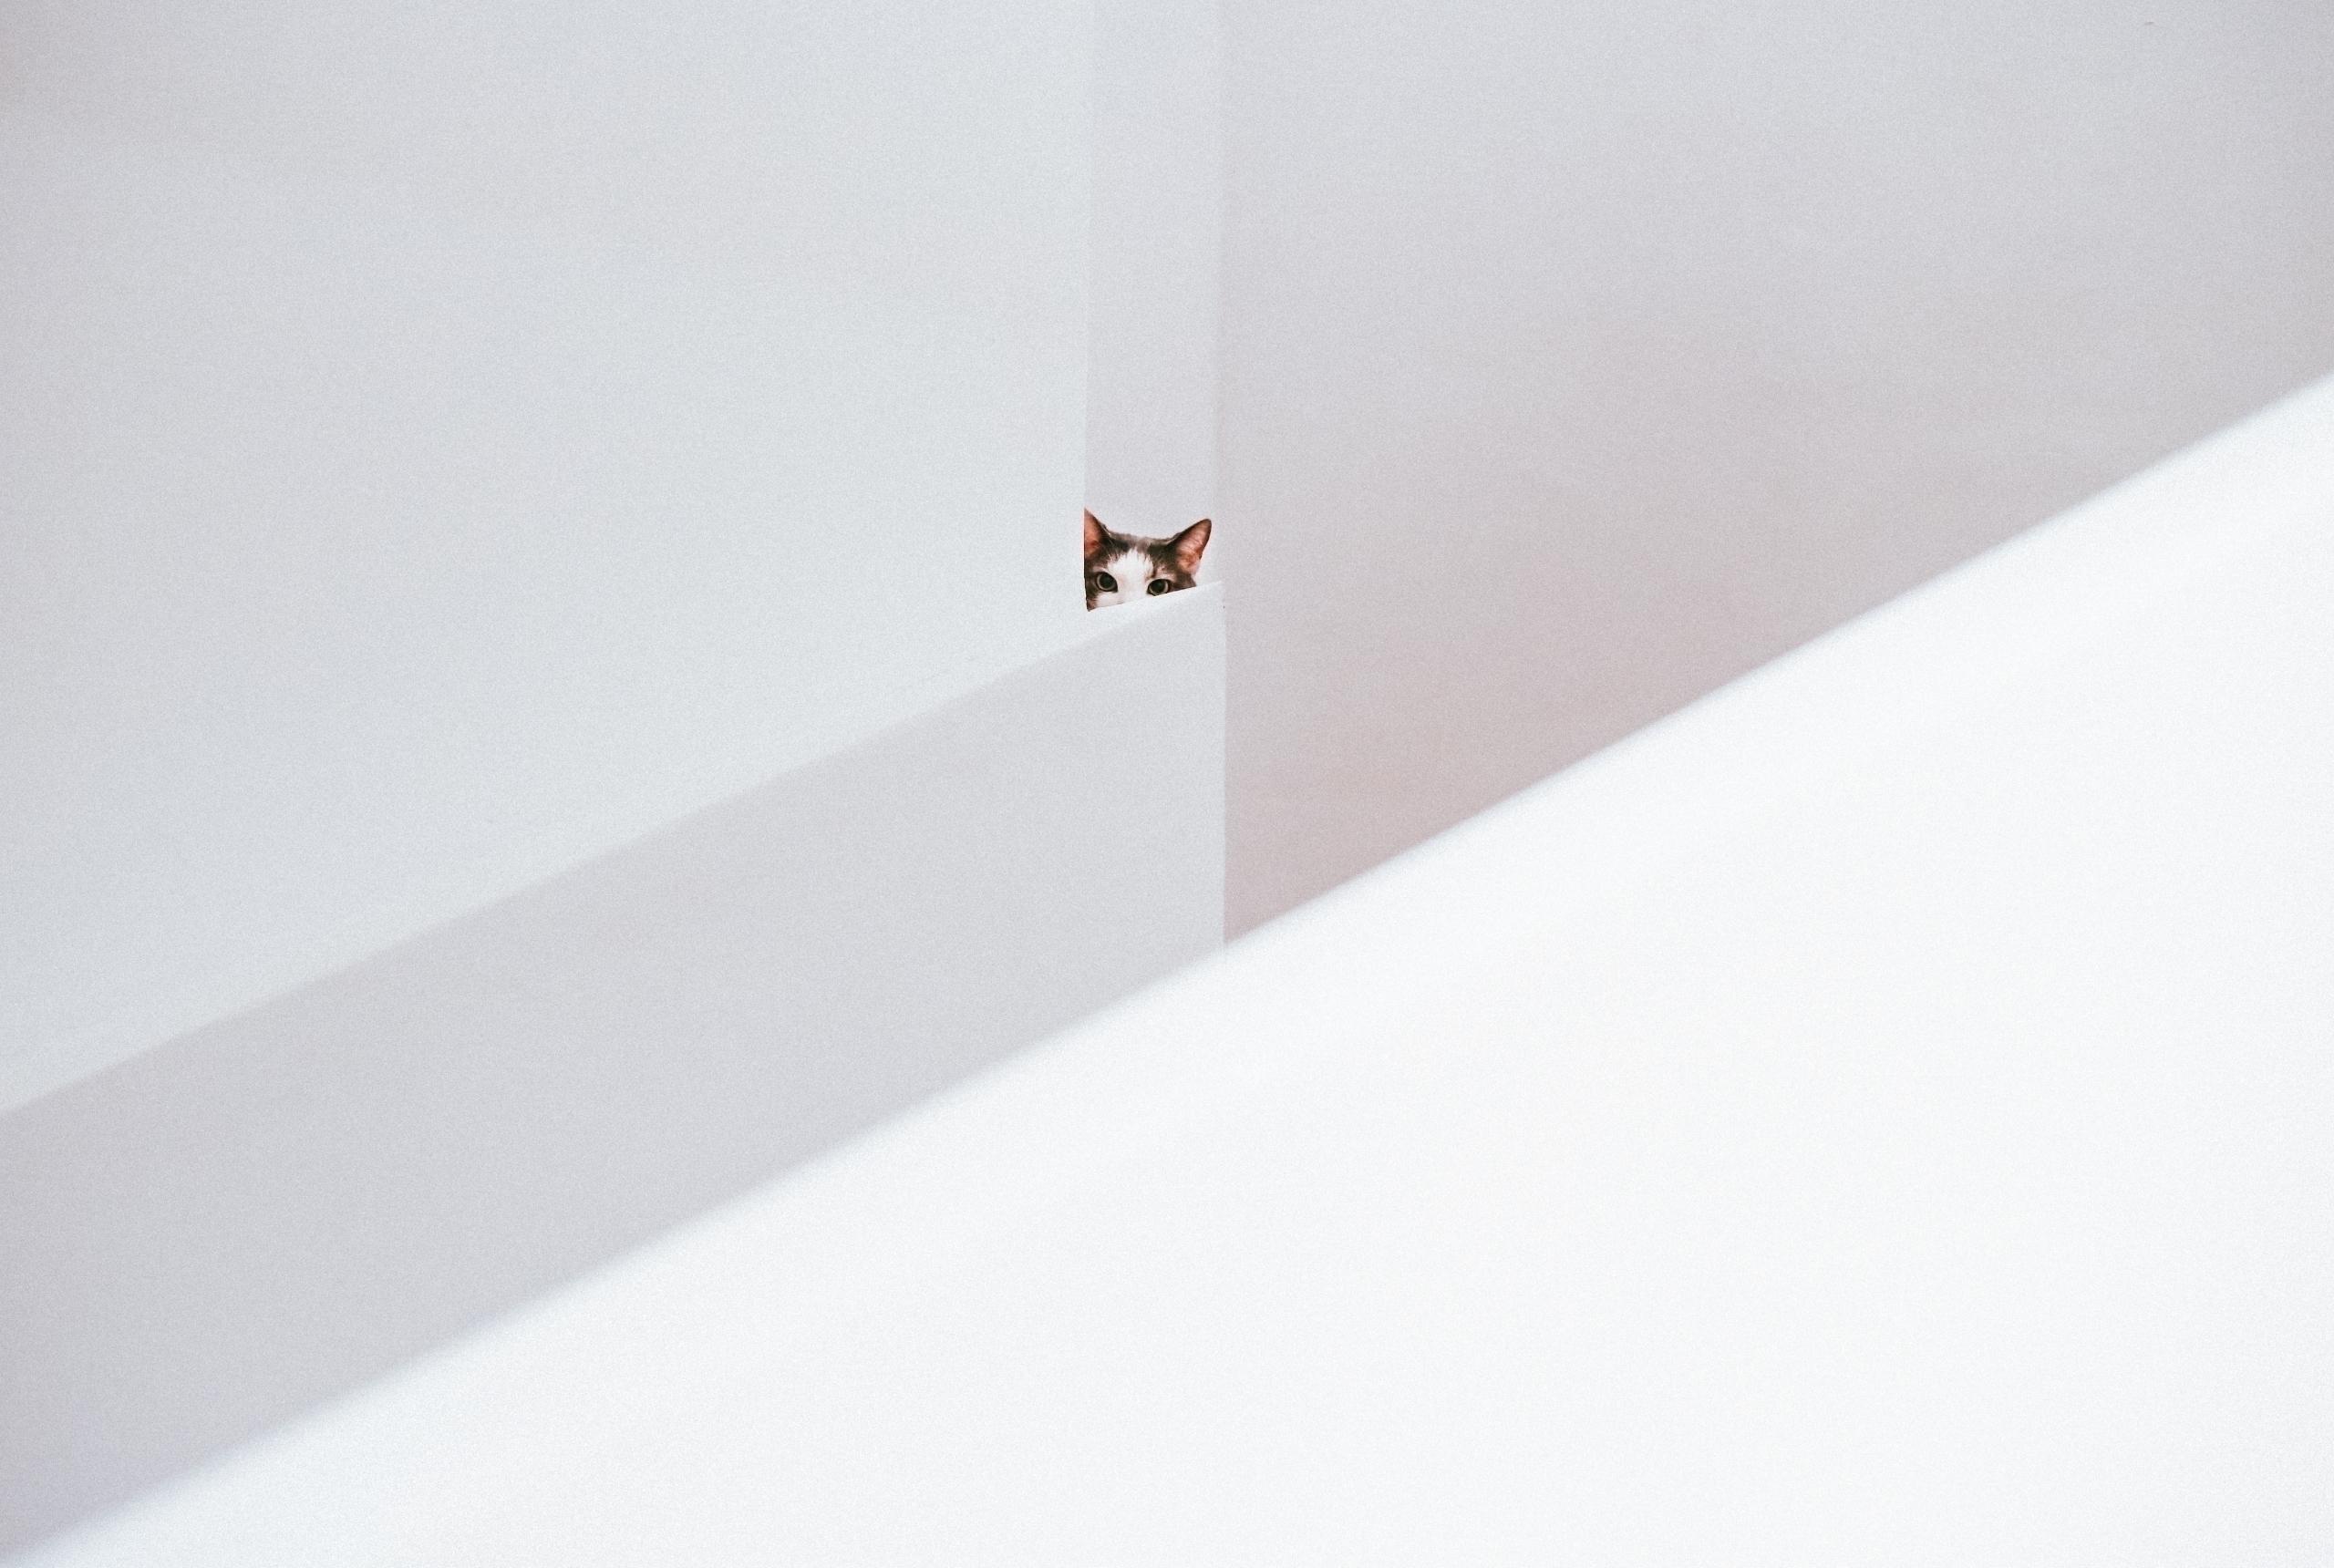 photograhy - cat, art, minimal, abstract - cataluna | ello